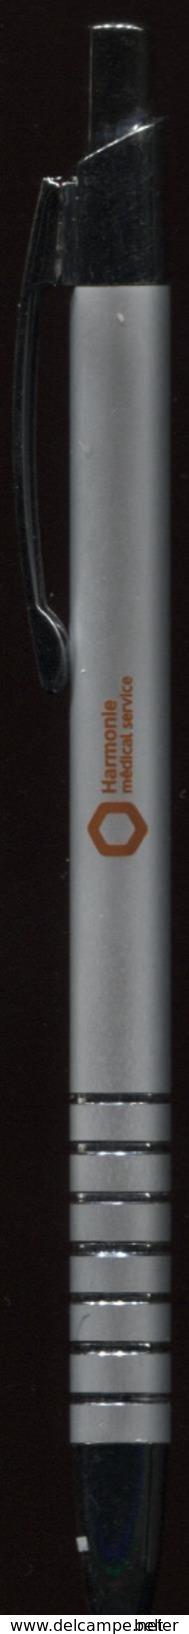 STYLO AVEC BOITE - Pens